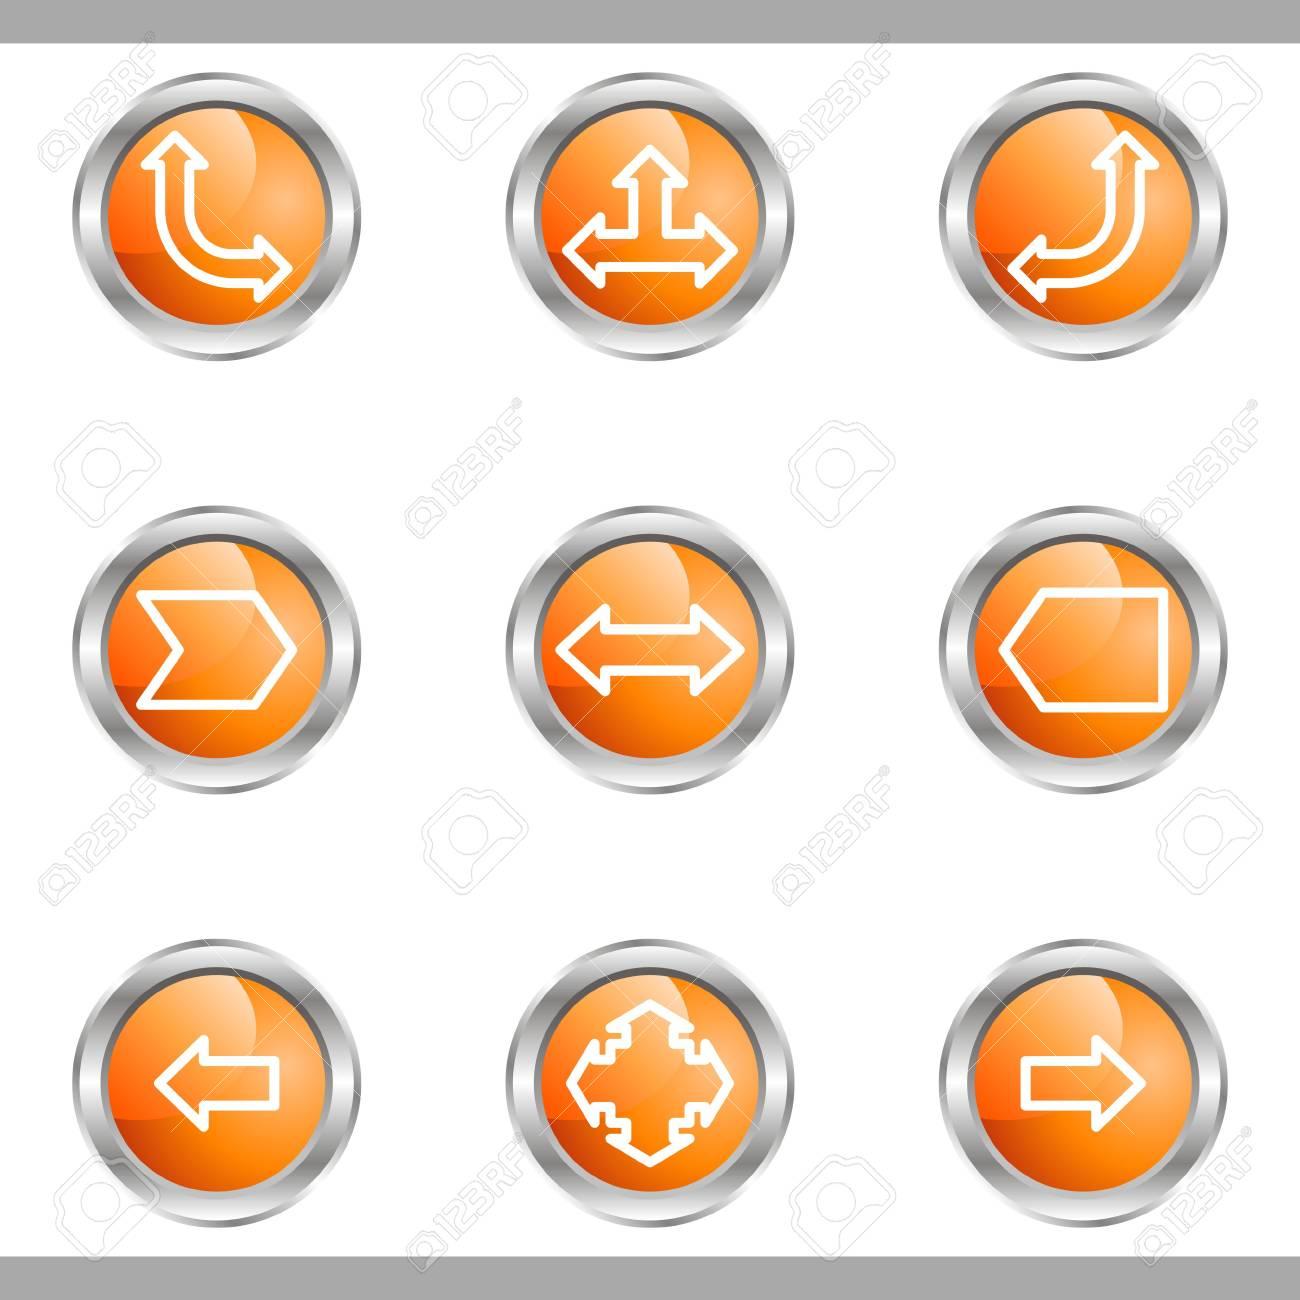 Set of 9 glossy web icons (set 12). Metallic circle. Stock Vector - 16682255